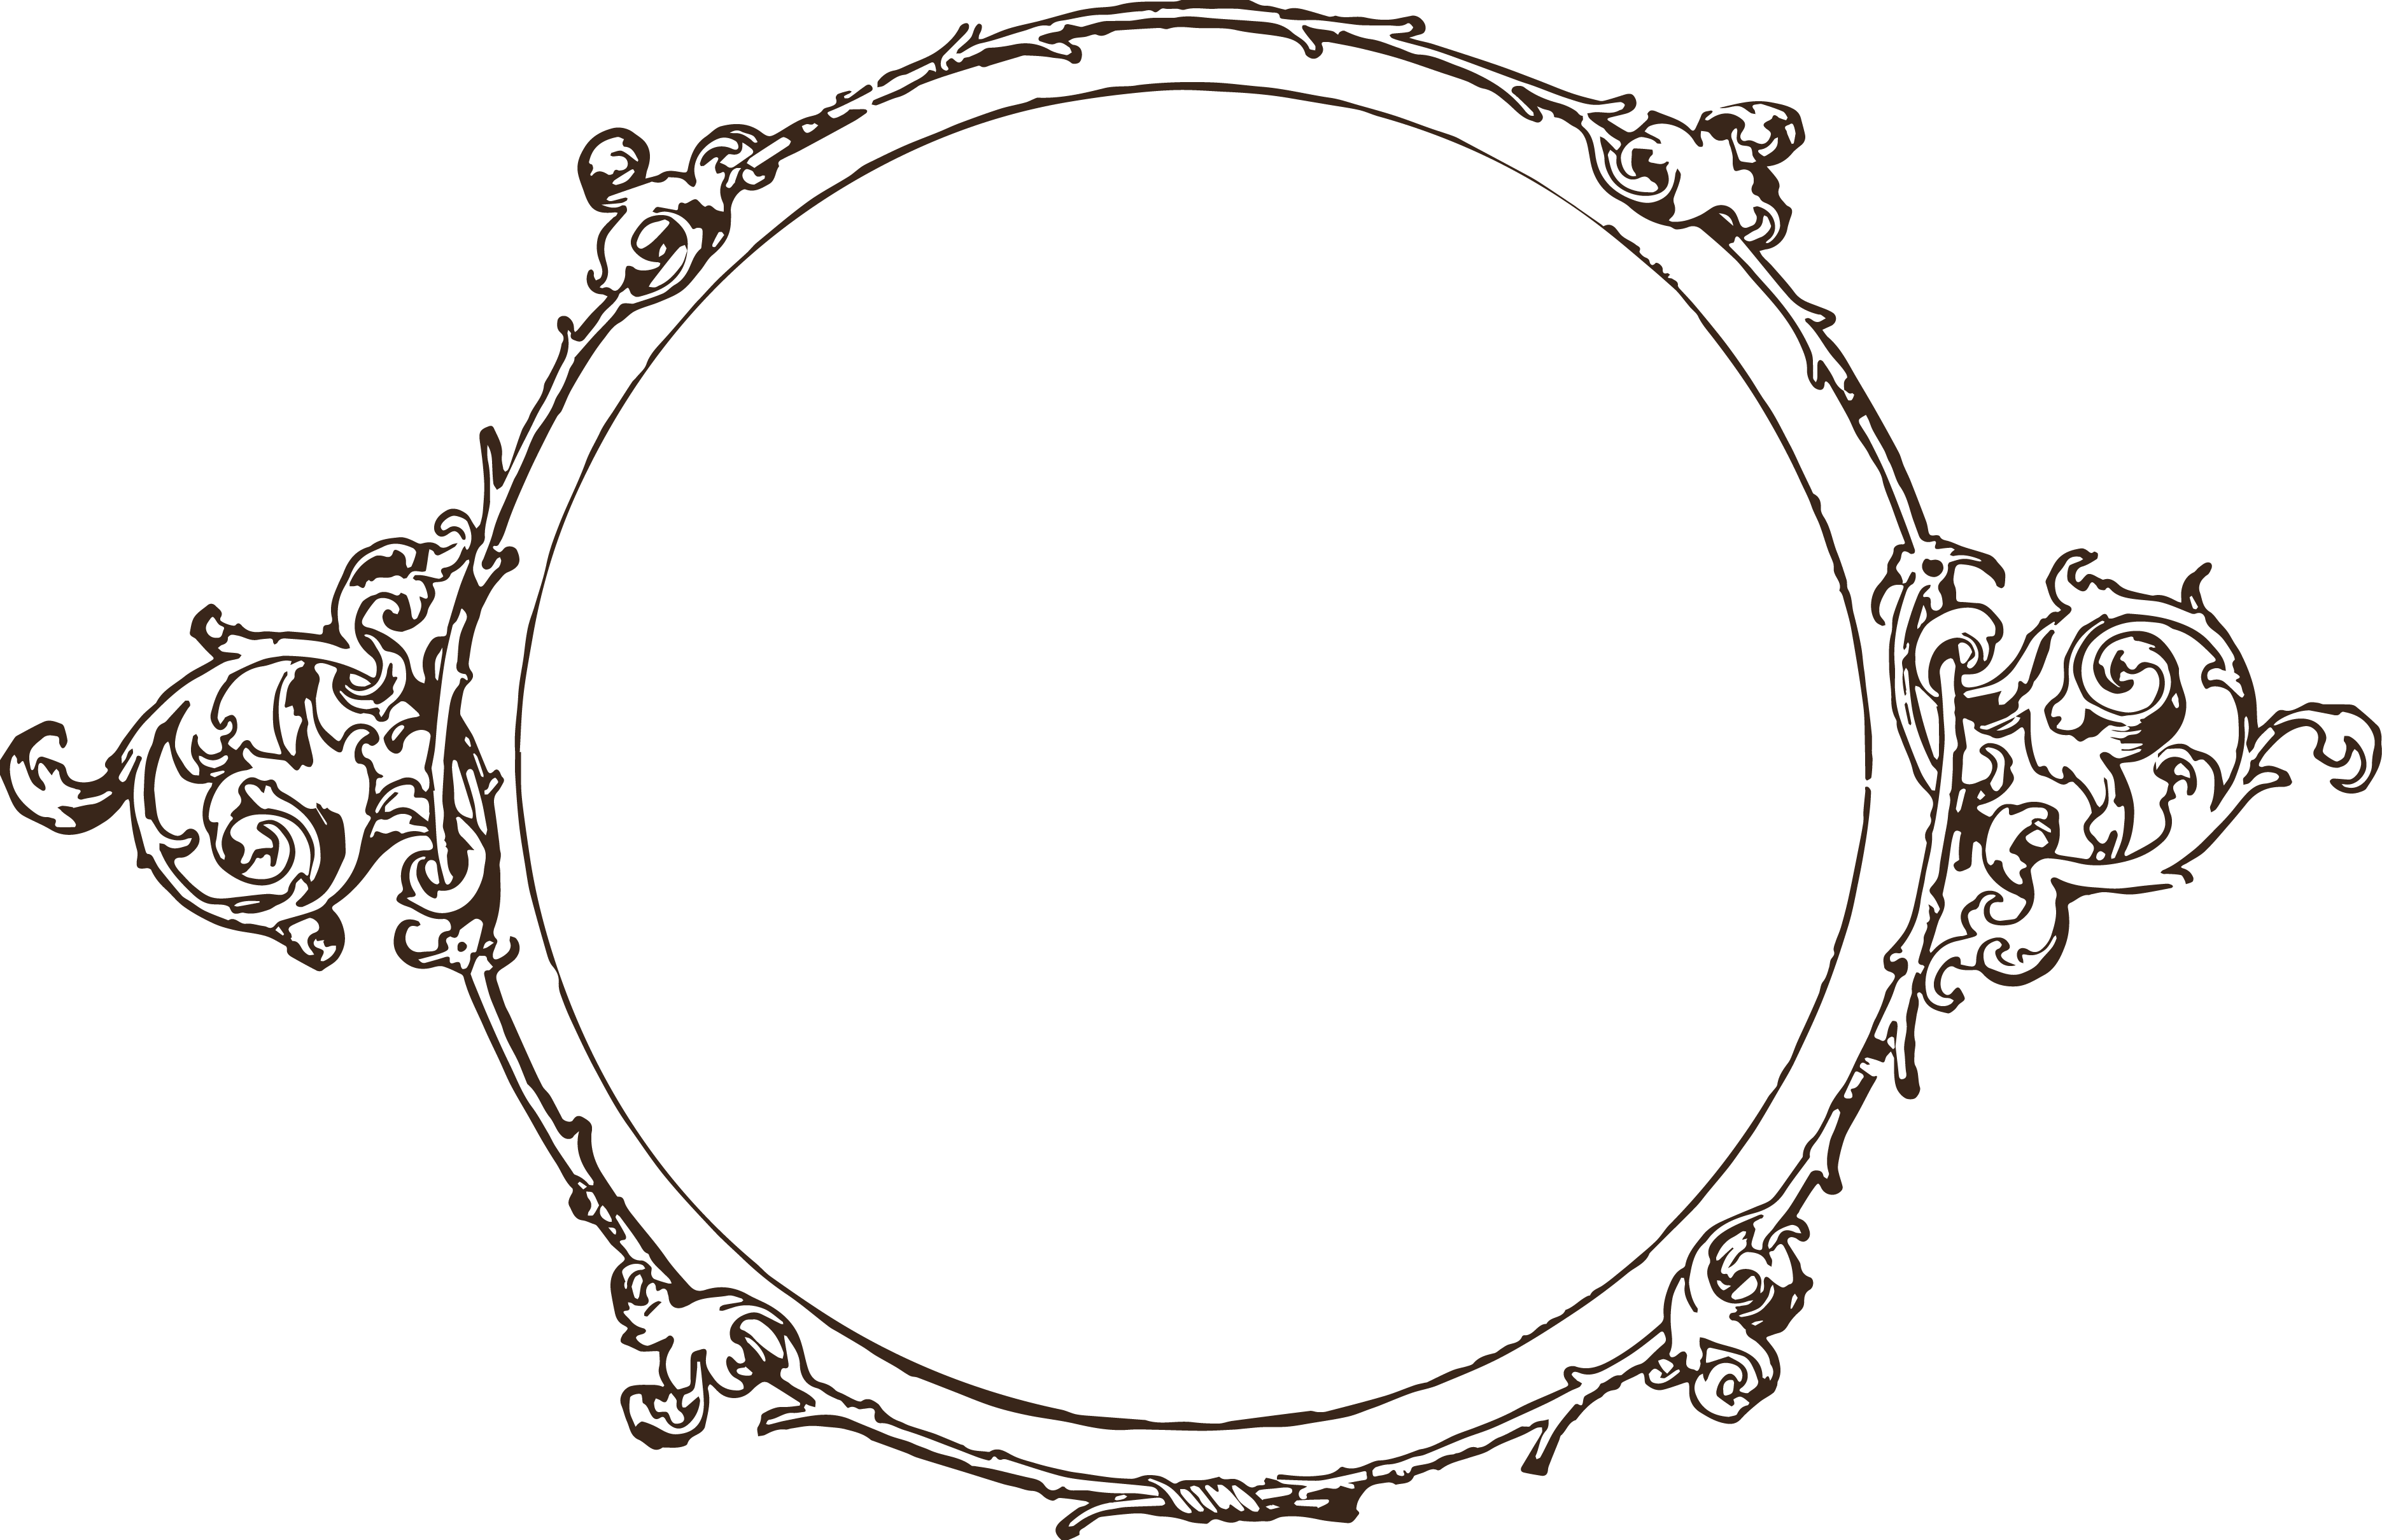 elegant circle border - Google Search | Banner clip art ...